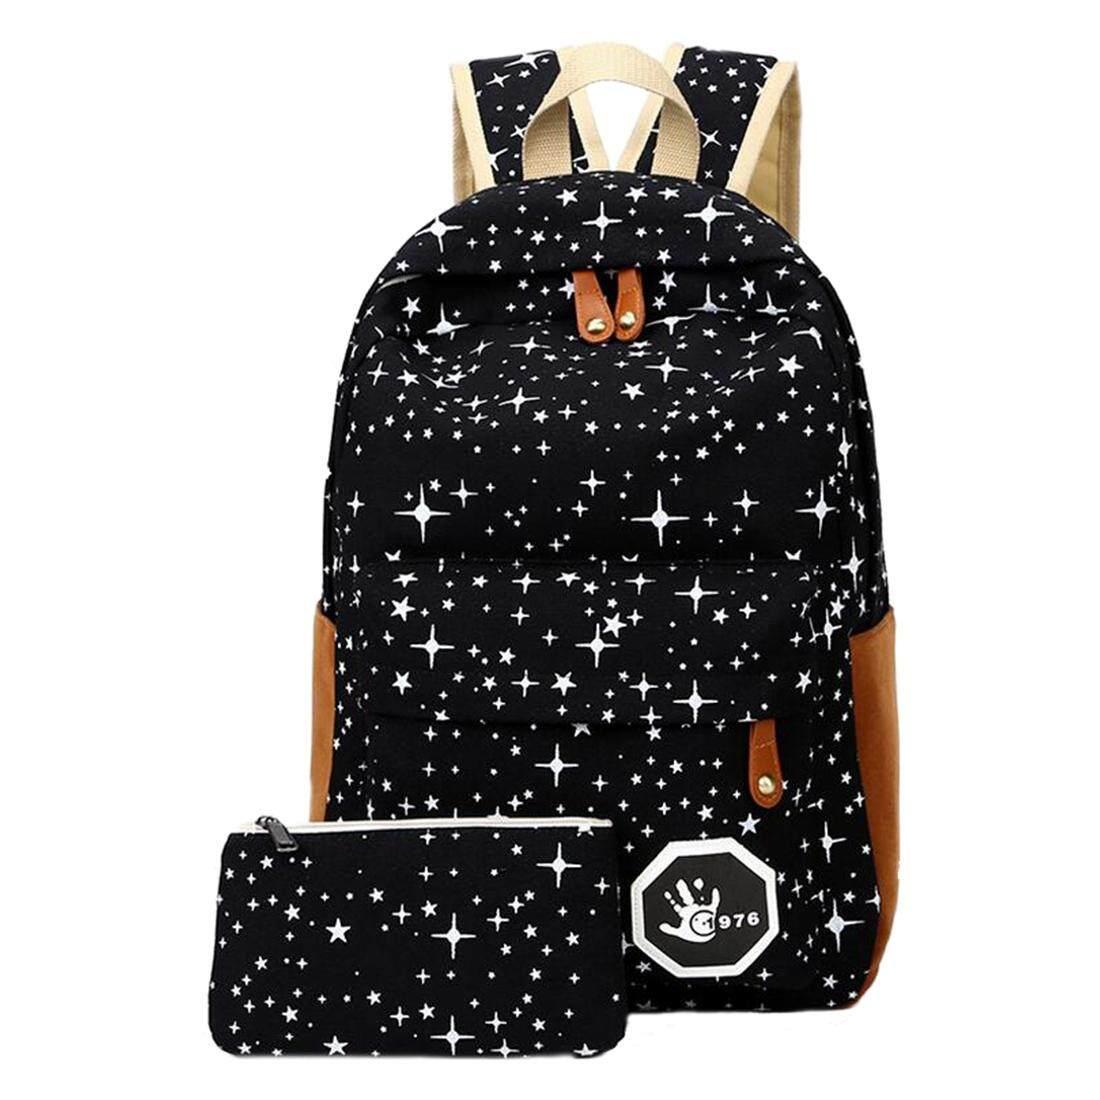 2 pcs set Fashion Star Women Men Canvas Backpack School Bag For girl Boy  Teenagers 0cd144fa87